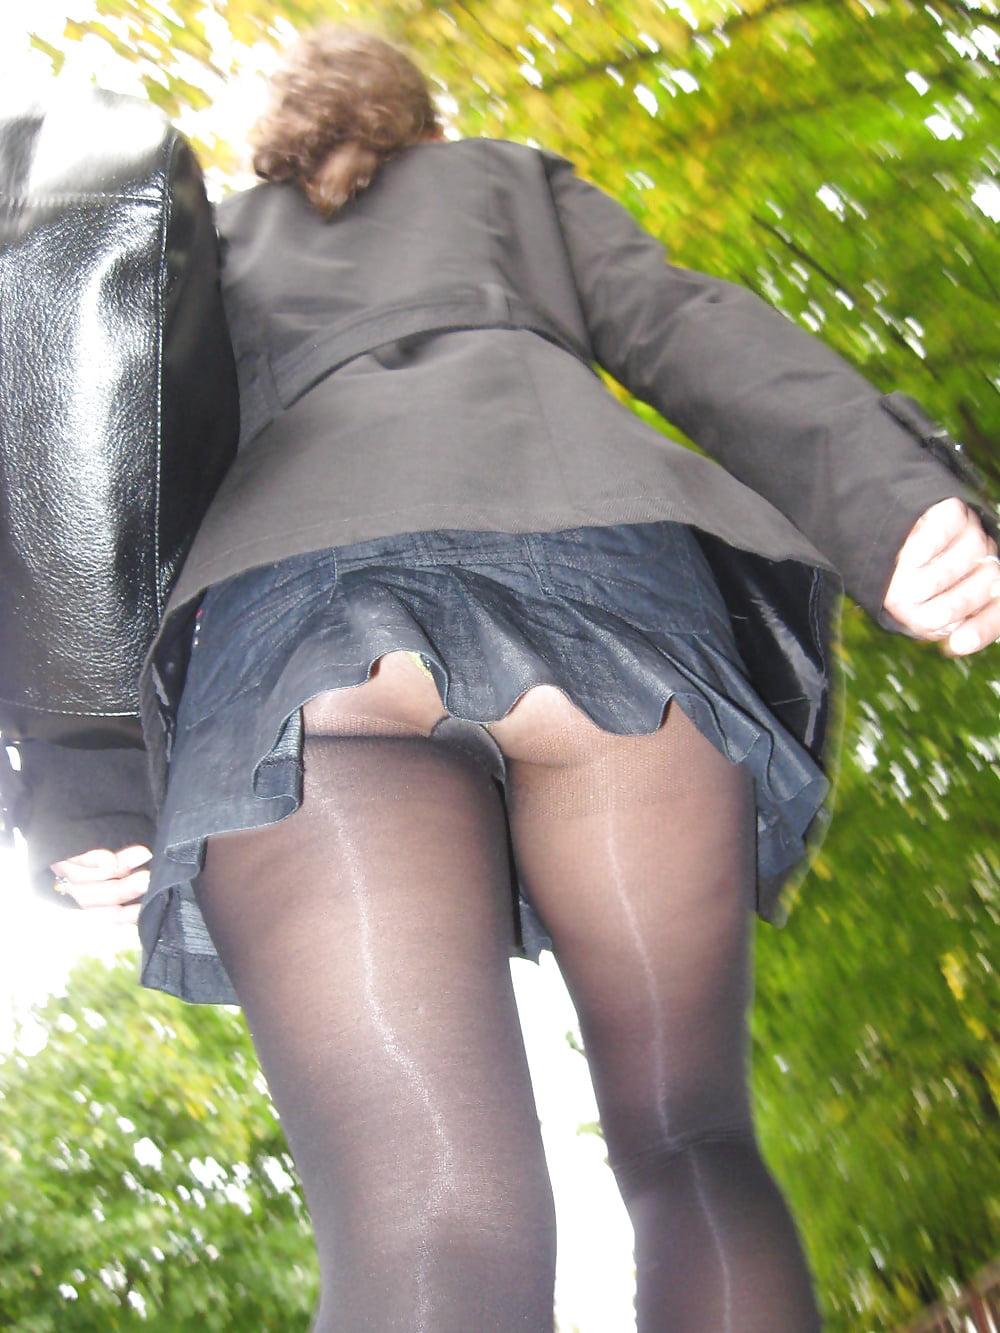 Upskirt pantyhose and foot